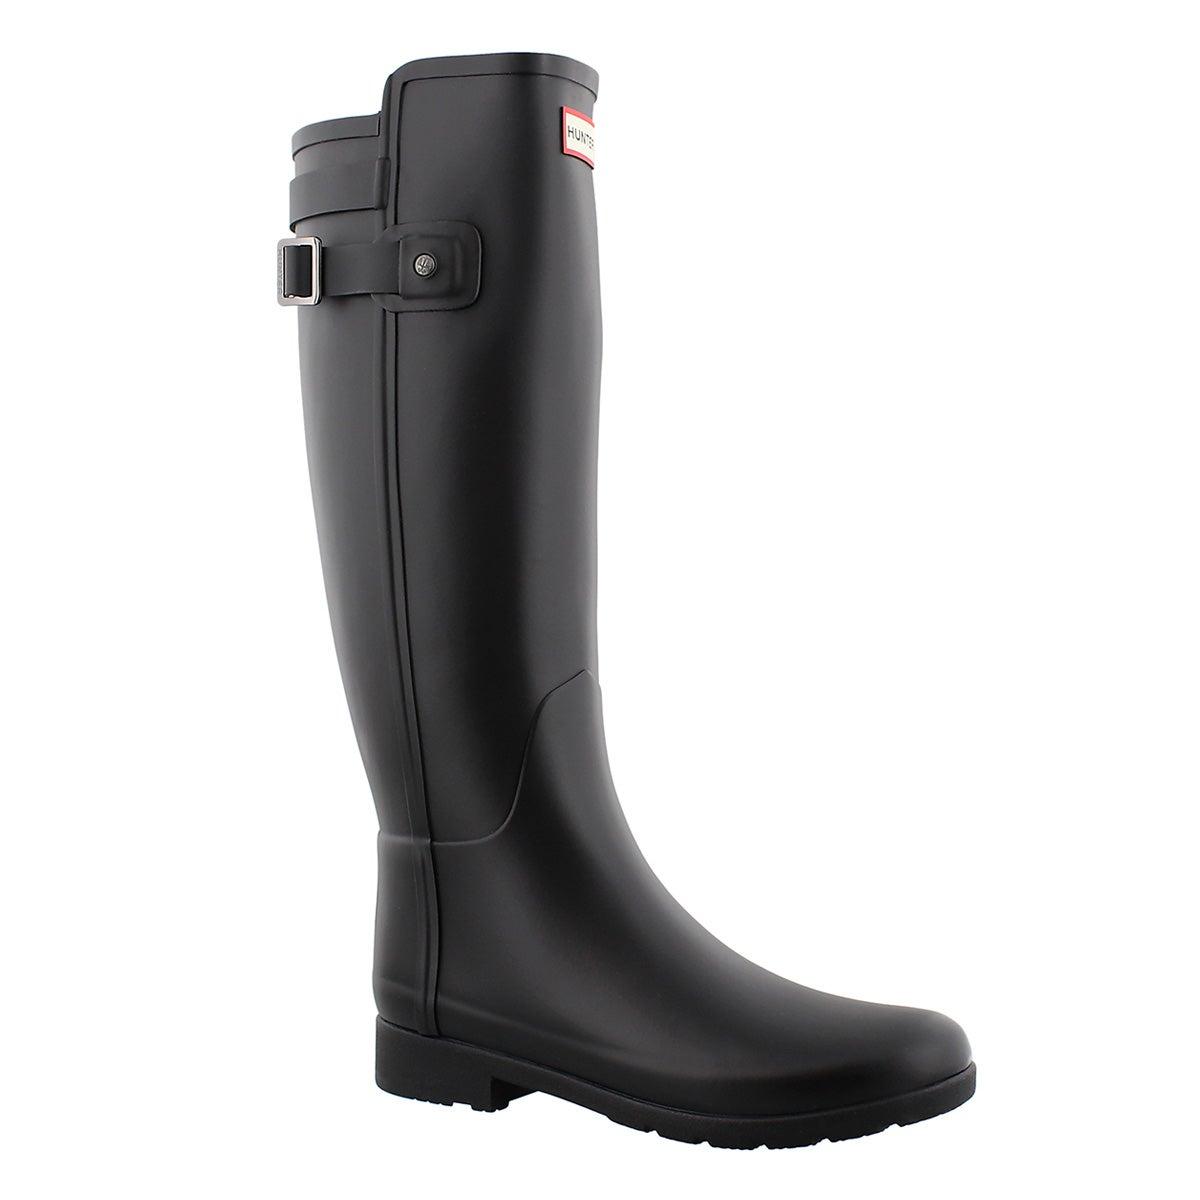 Women's REFINED BACK STRAP black rain boots